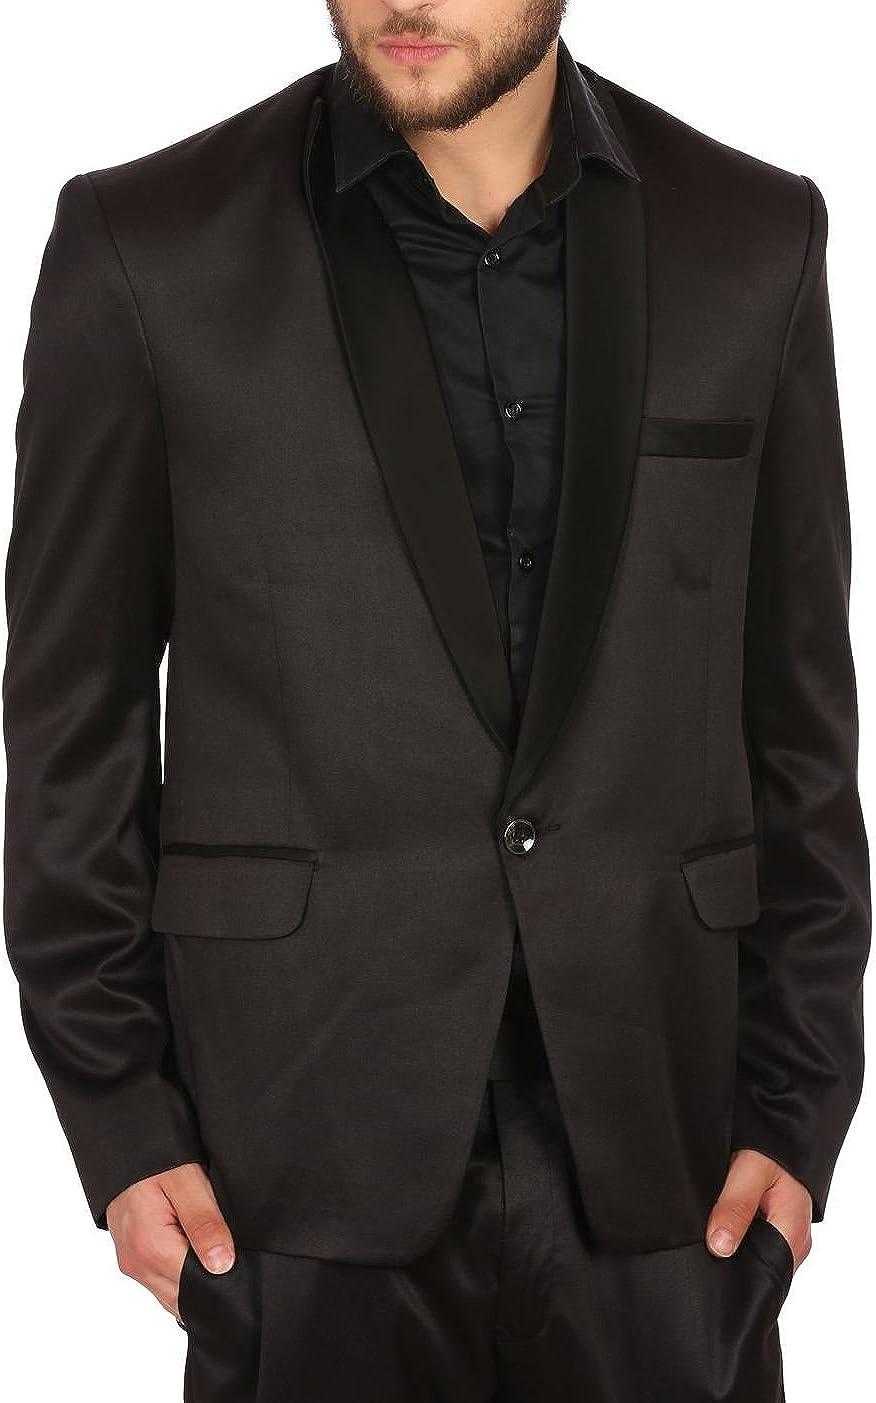 WINTAGE Men's Poly Blend Notch Lapel Tuxedo Blazer: Black